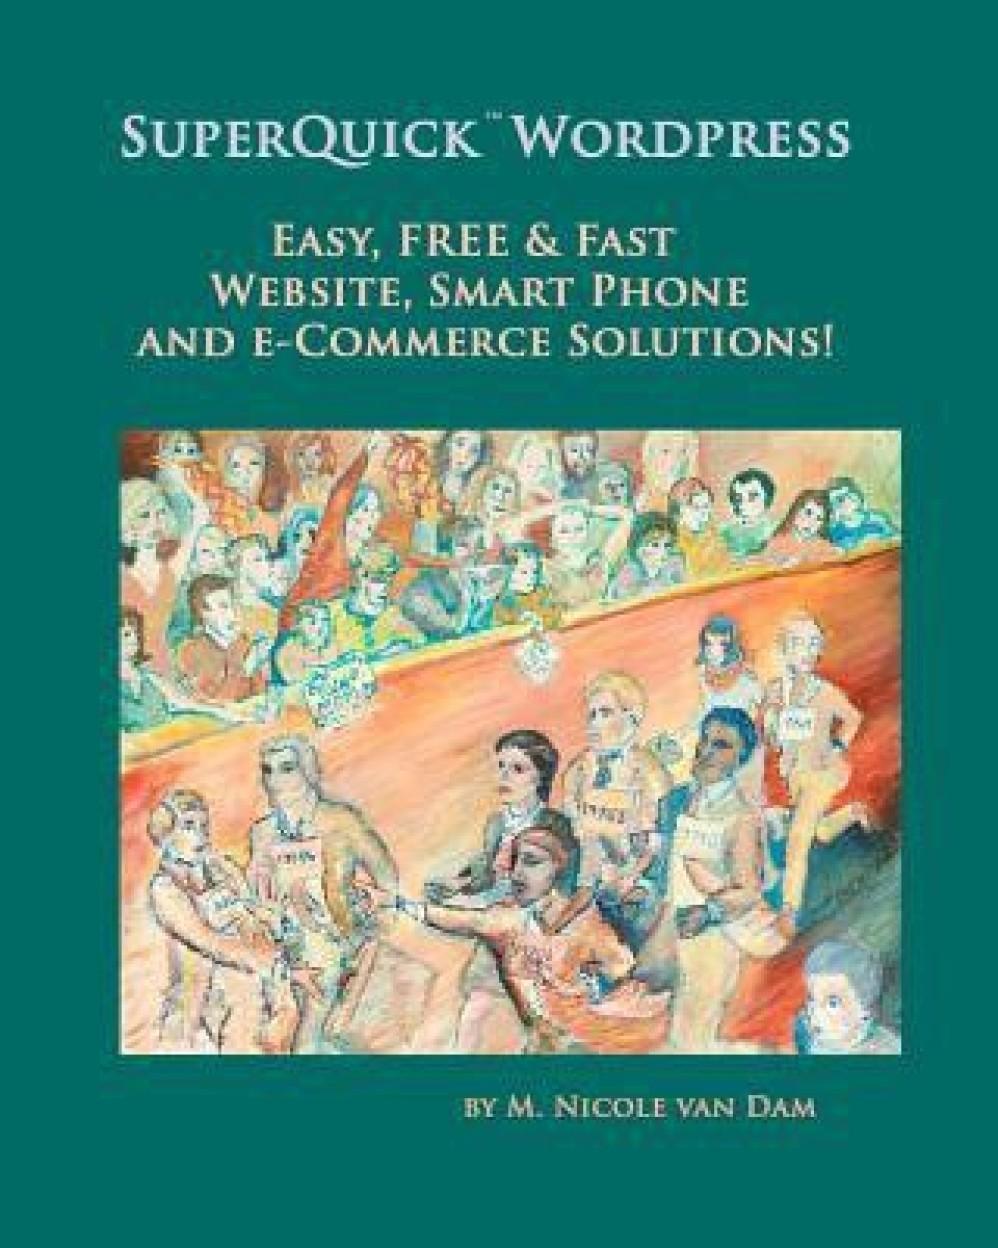 Superquick Wordpress